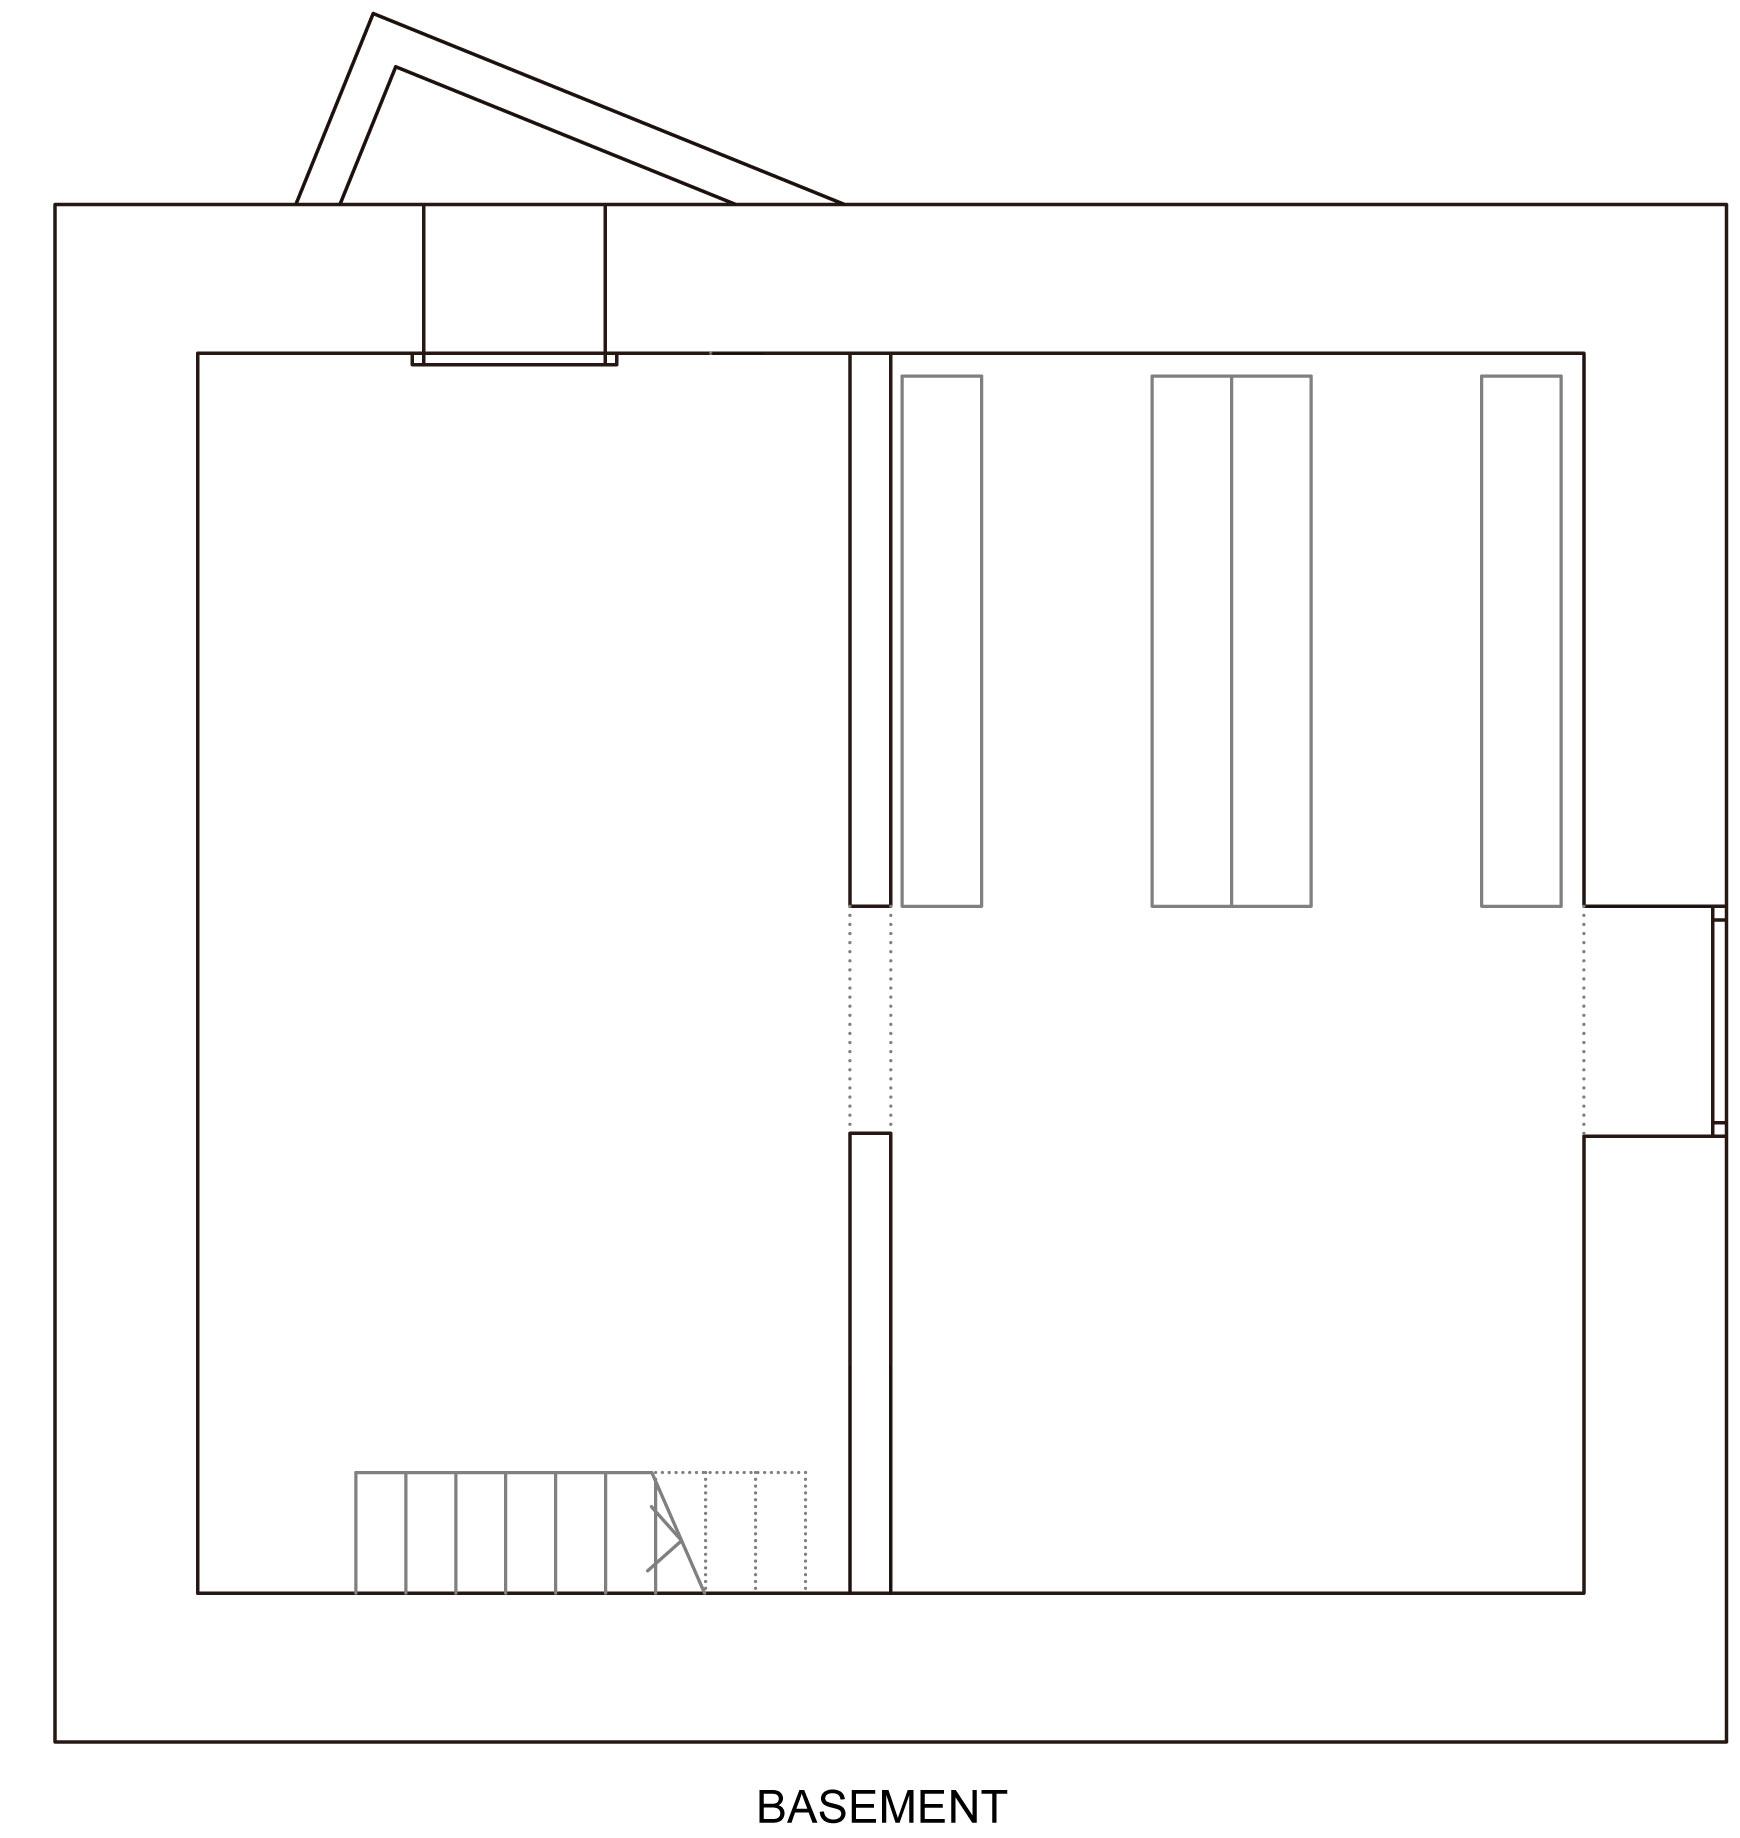 Basement Plan, Holiday Home Renovation in Ayent, Switzerland